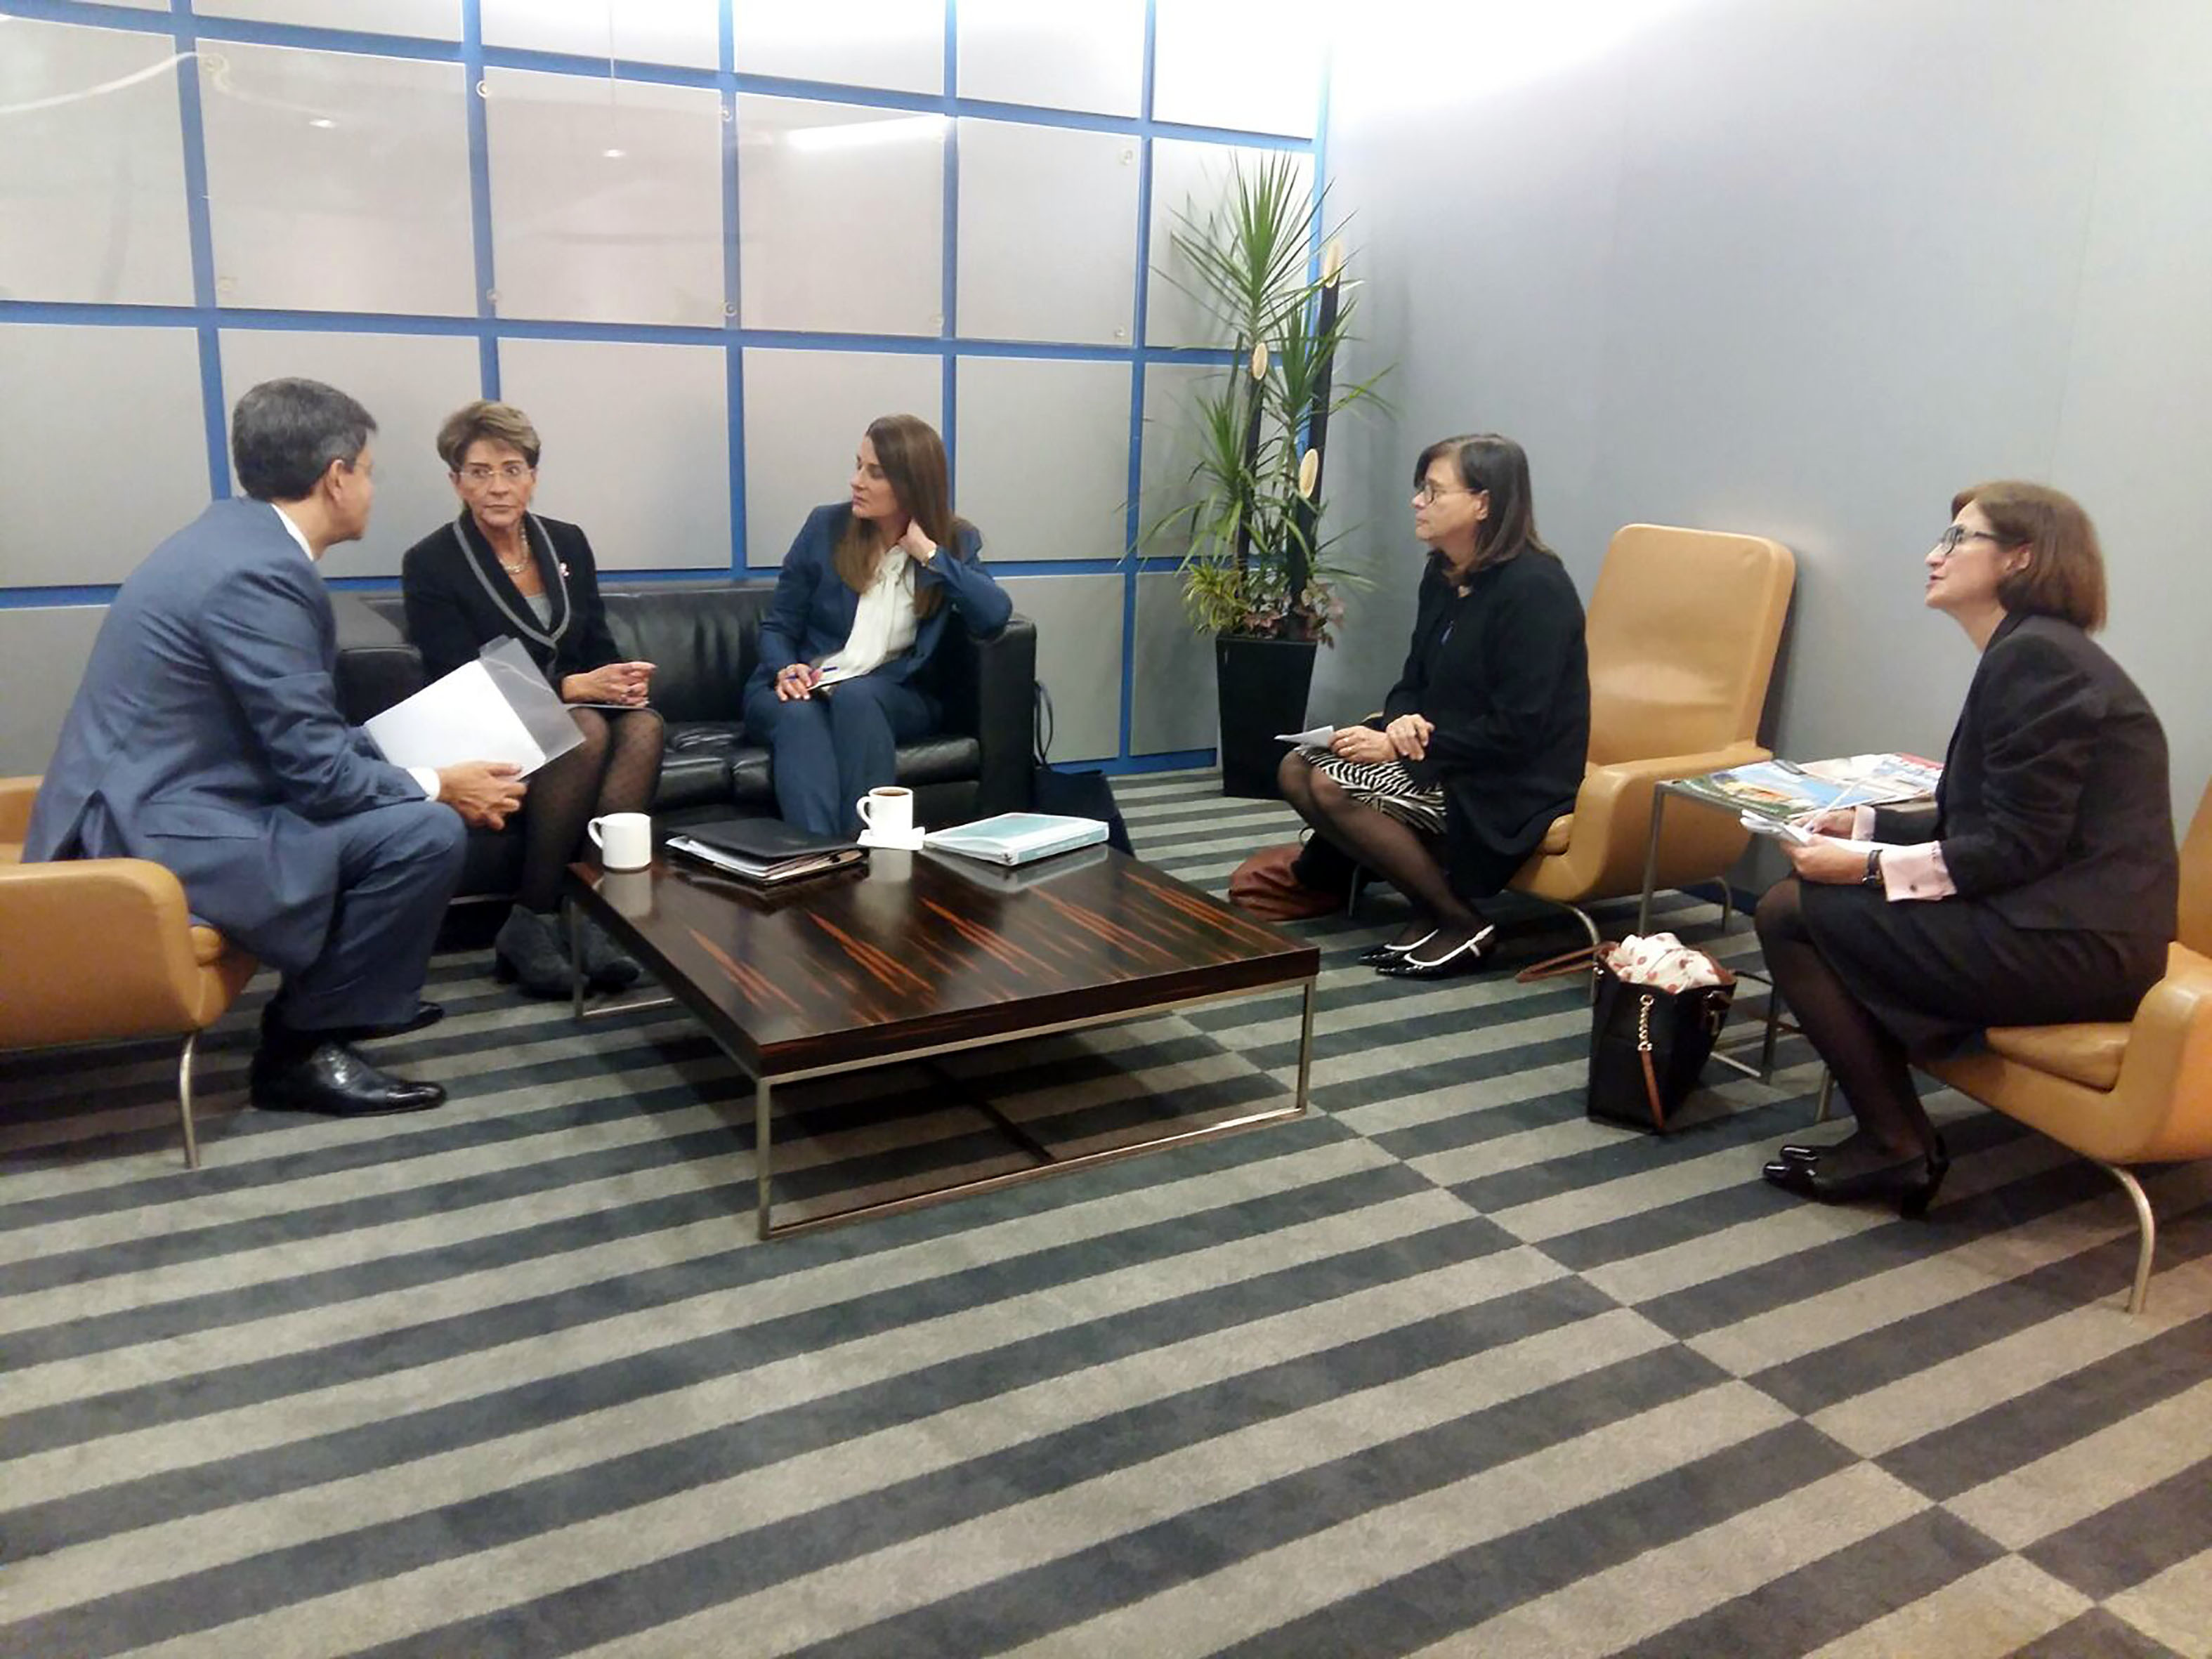 Mercedes Juan y Melinda Gates dialogan sobre la iniciativa salud Mesoamérica 2015.